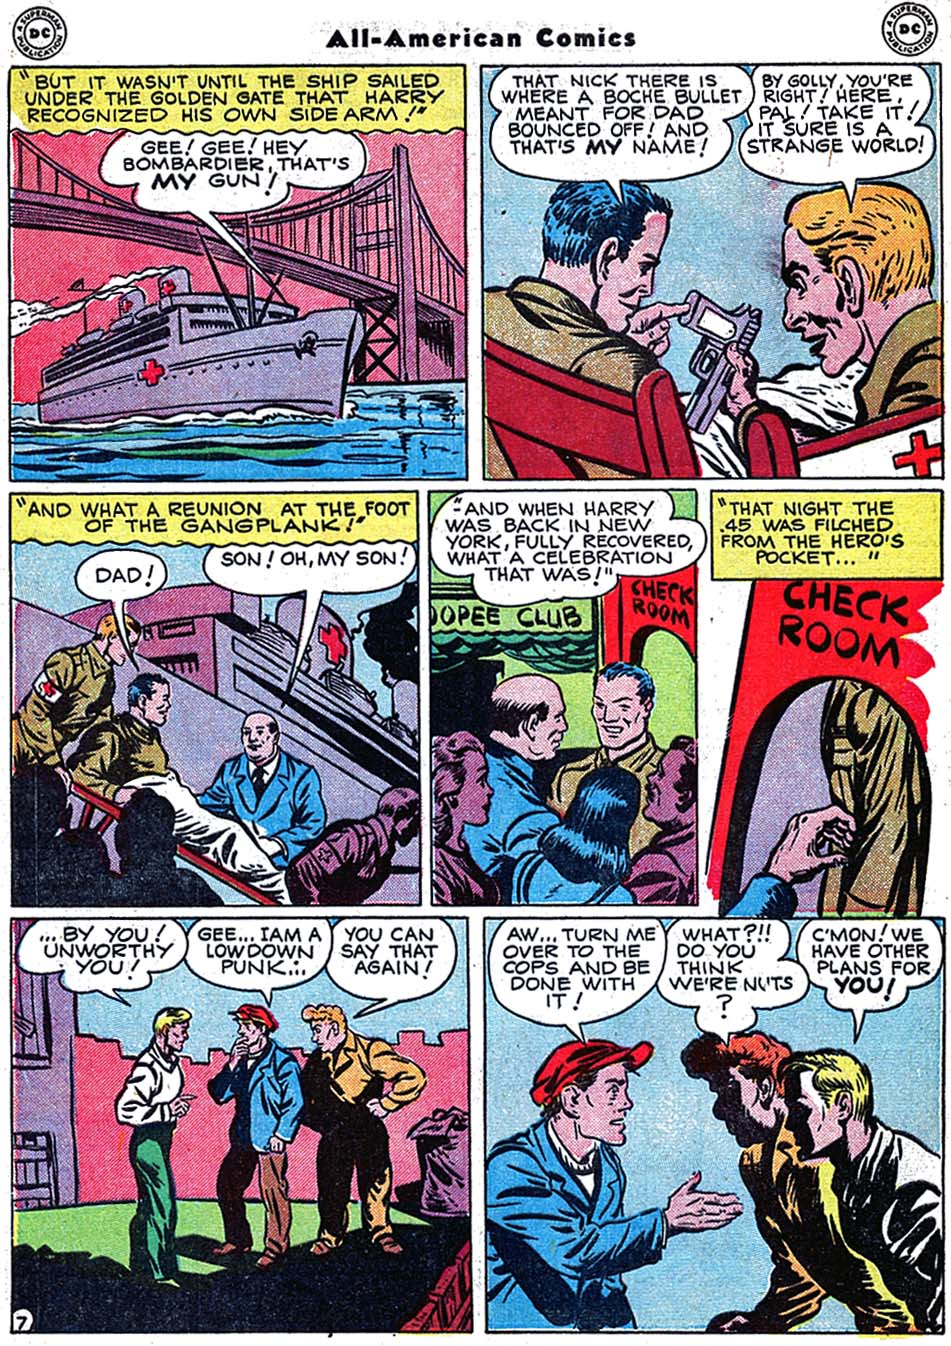 Read online All-American Comics (1939) comic -  Issue #72 - 48